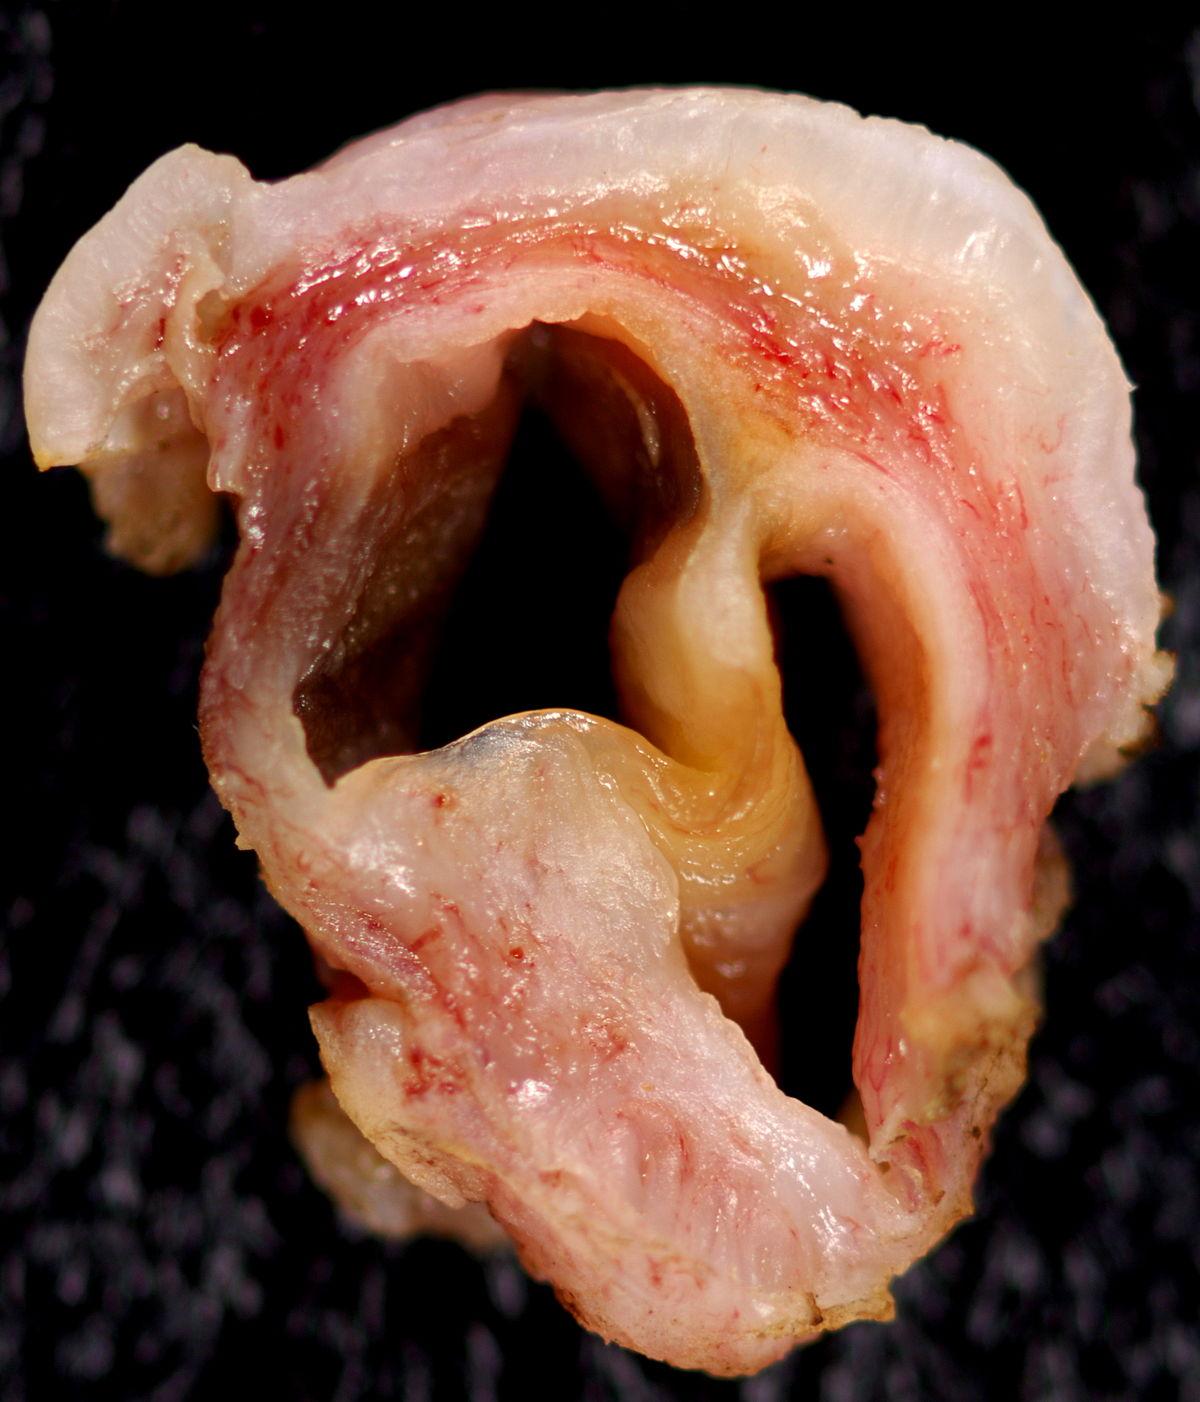 Gartner's duct cyst - Wikipedia